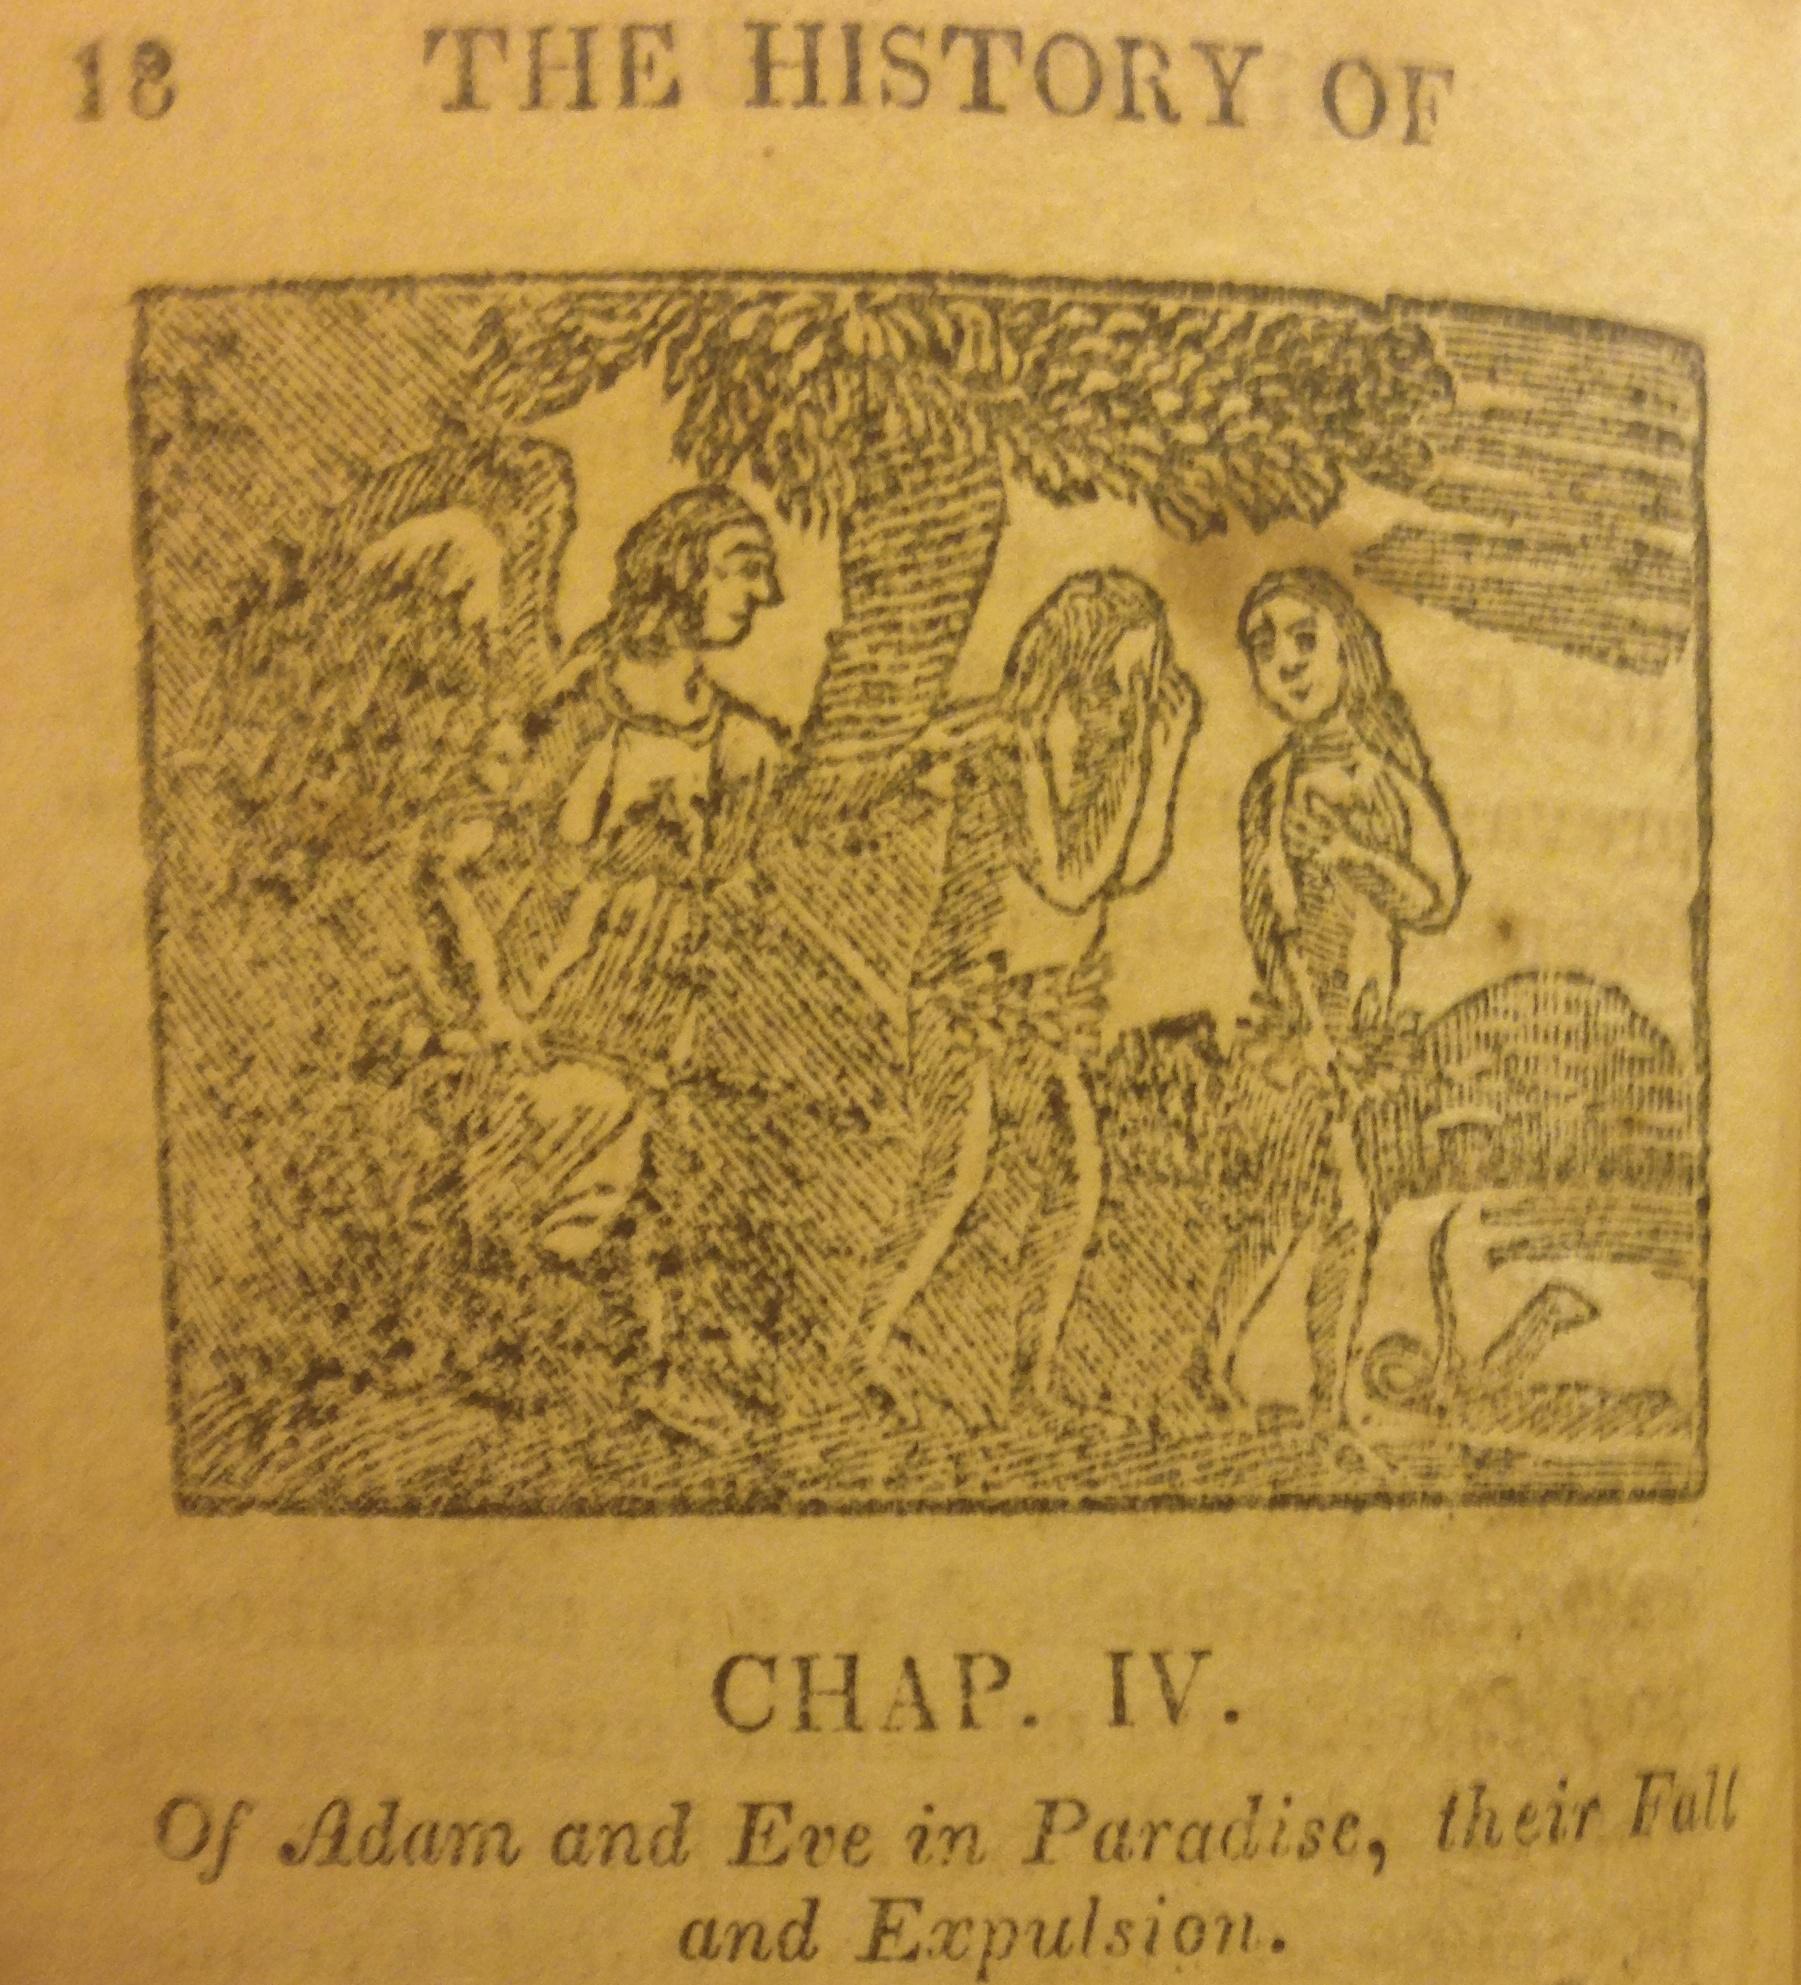 Thomas Carey's Simian Adam and Eve